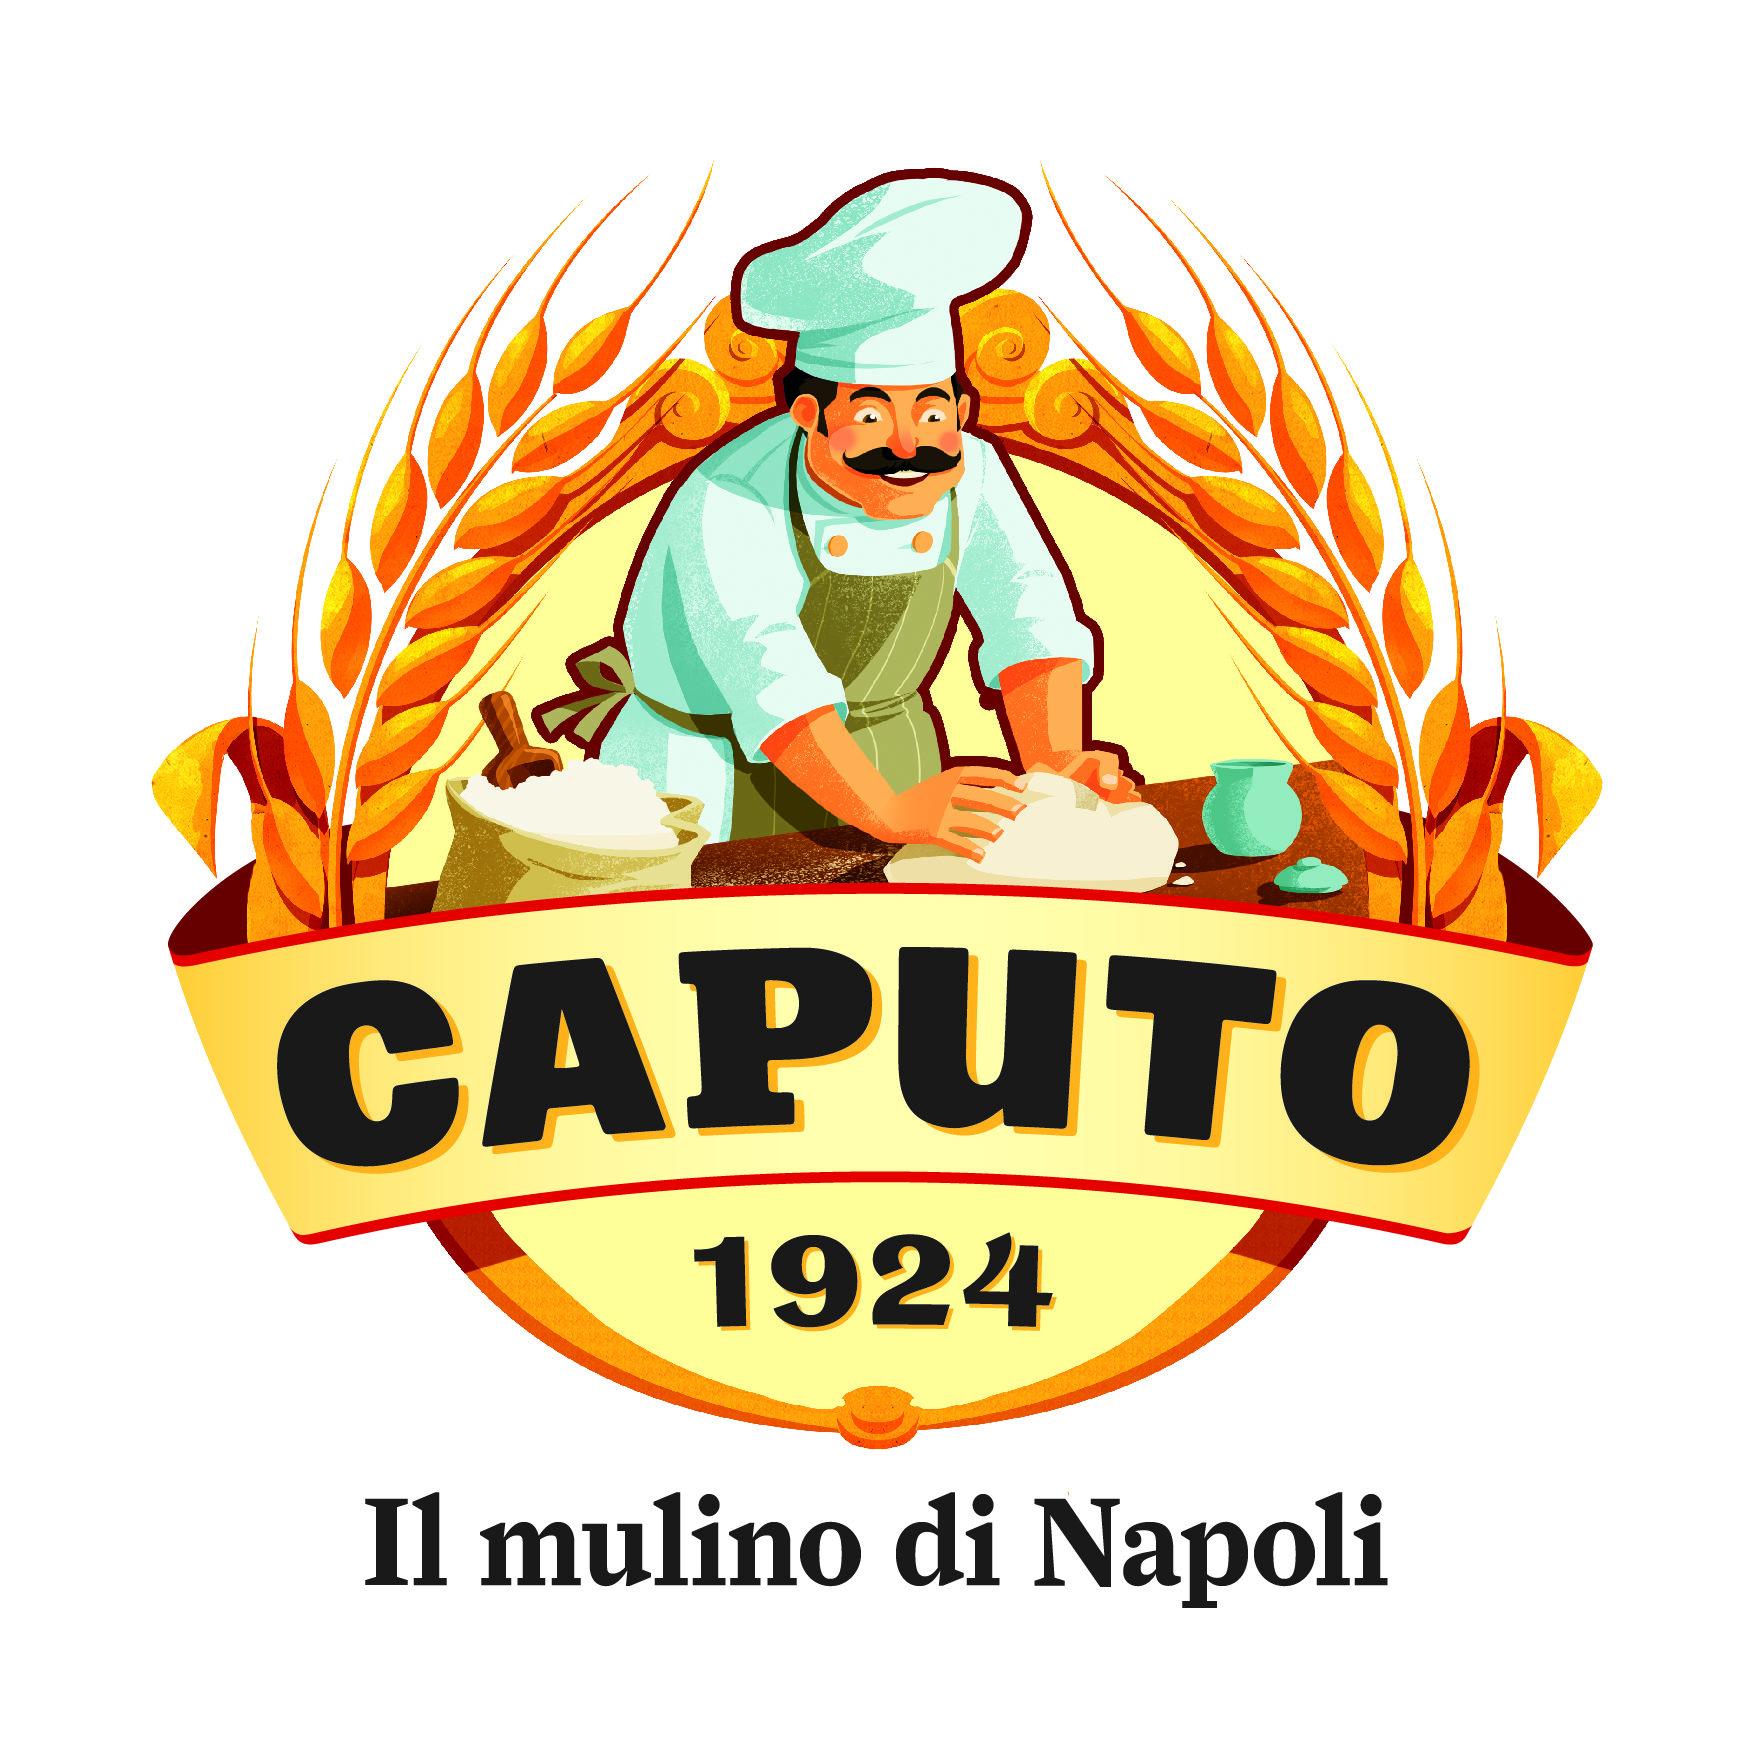 Molino Caputo CYMK + tagline